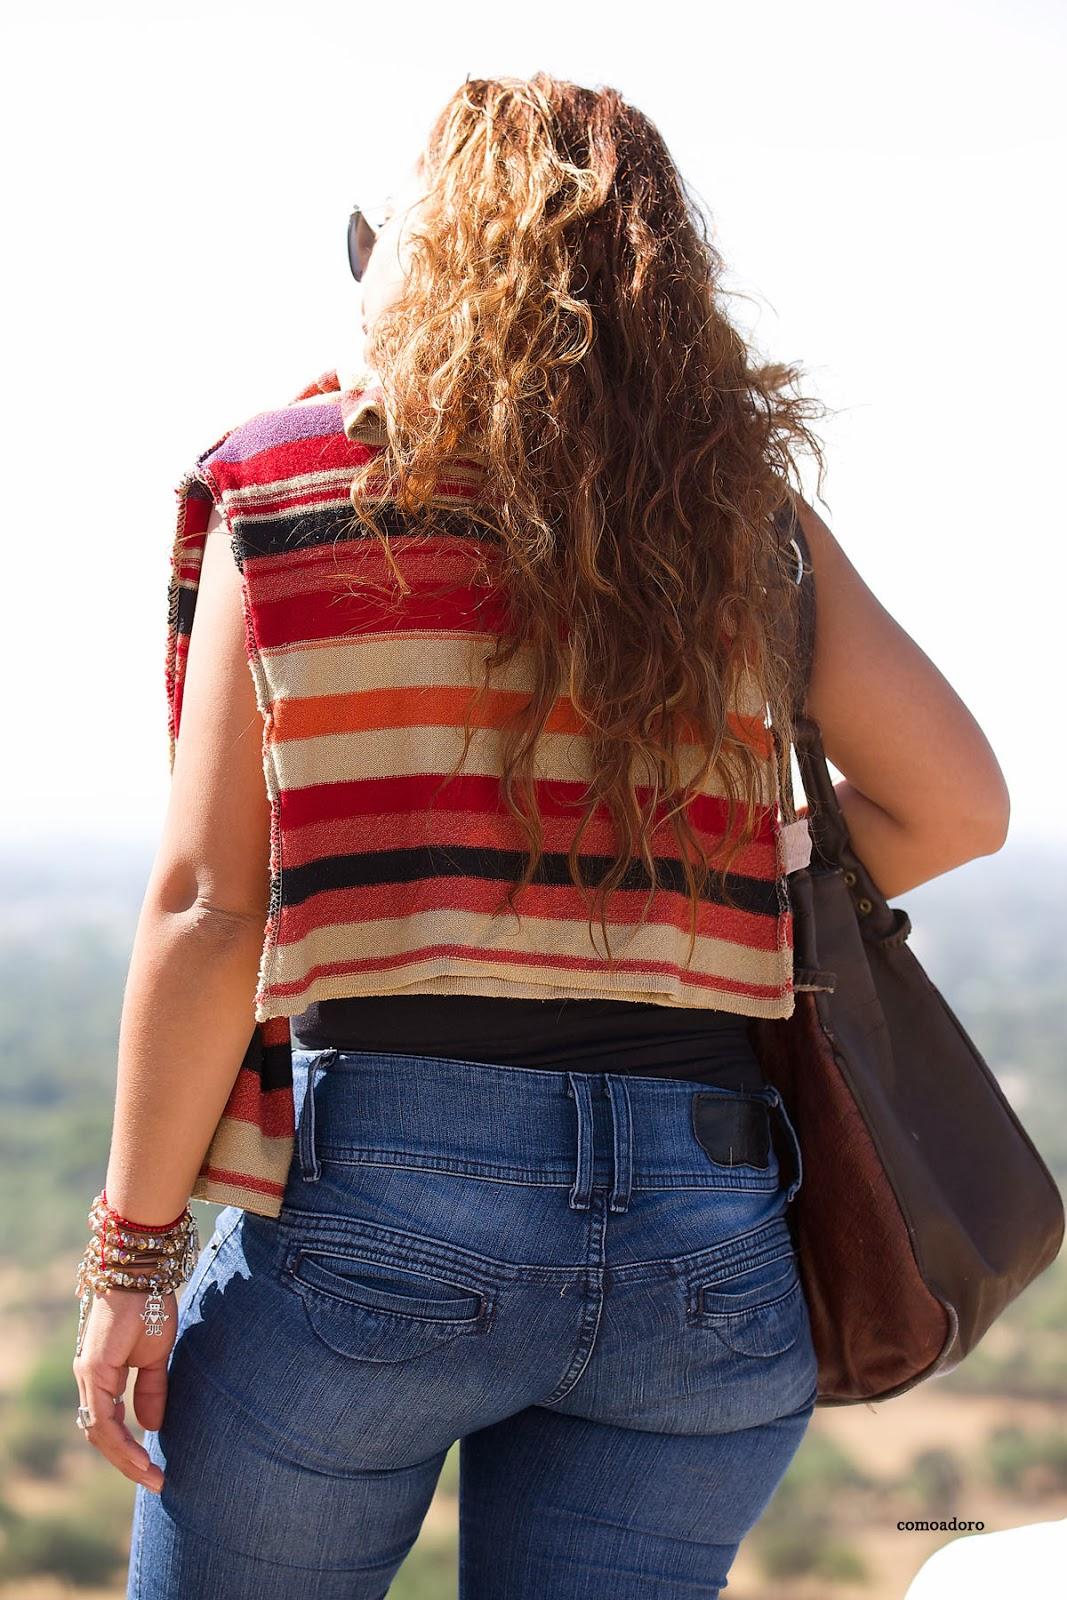 Madura Culona En Pantalon Bien Apretado